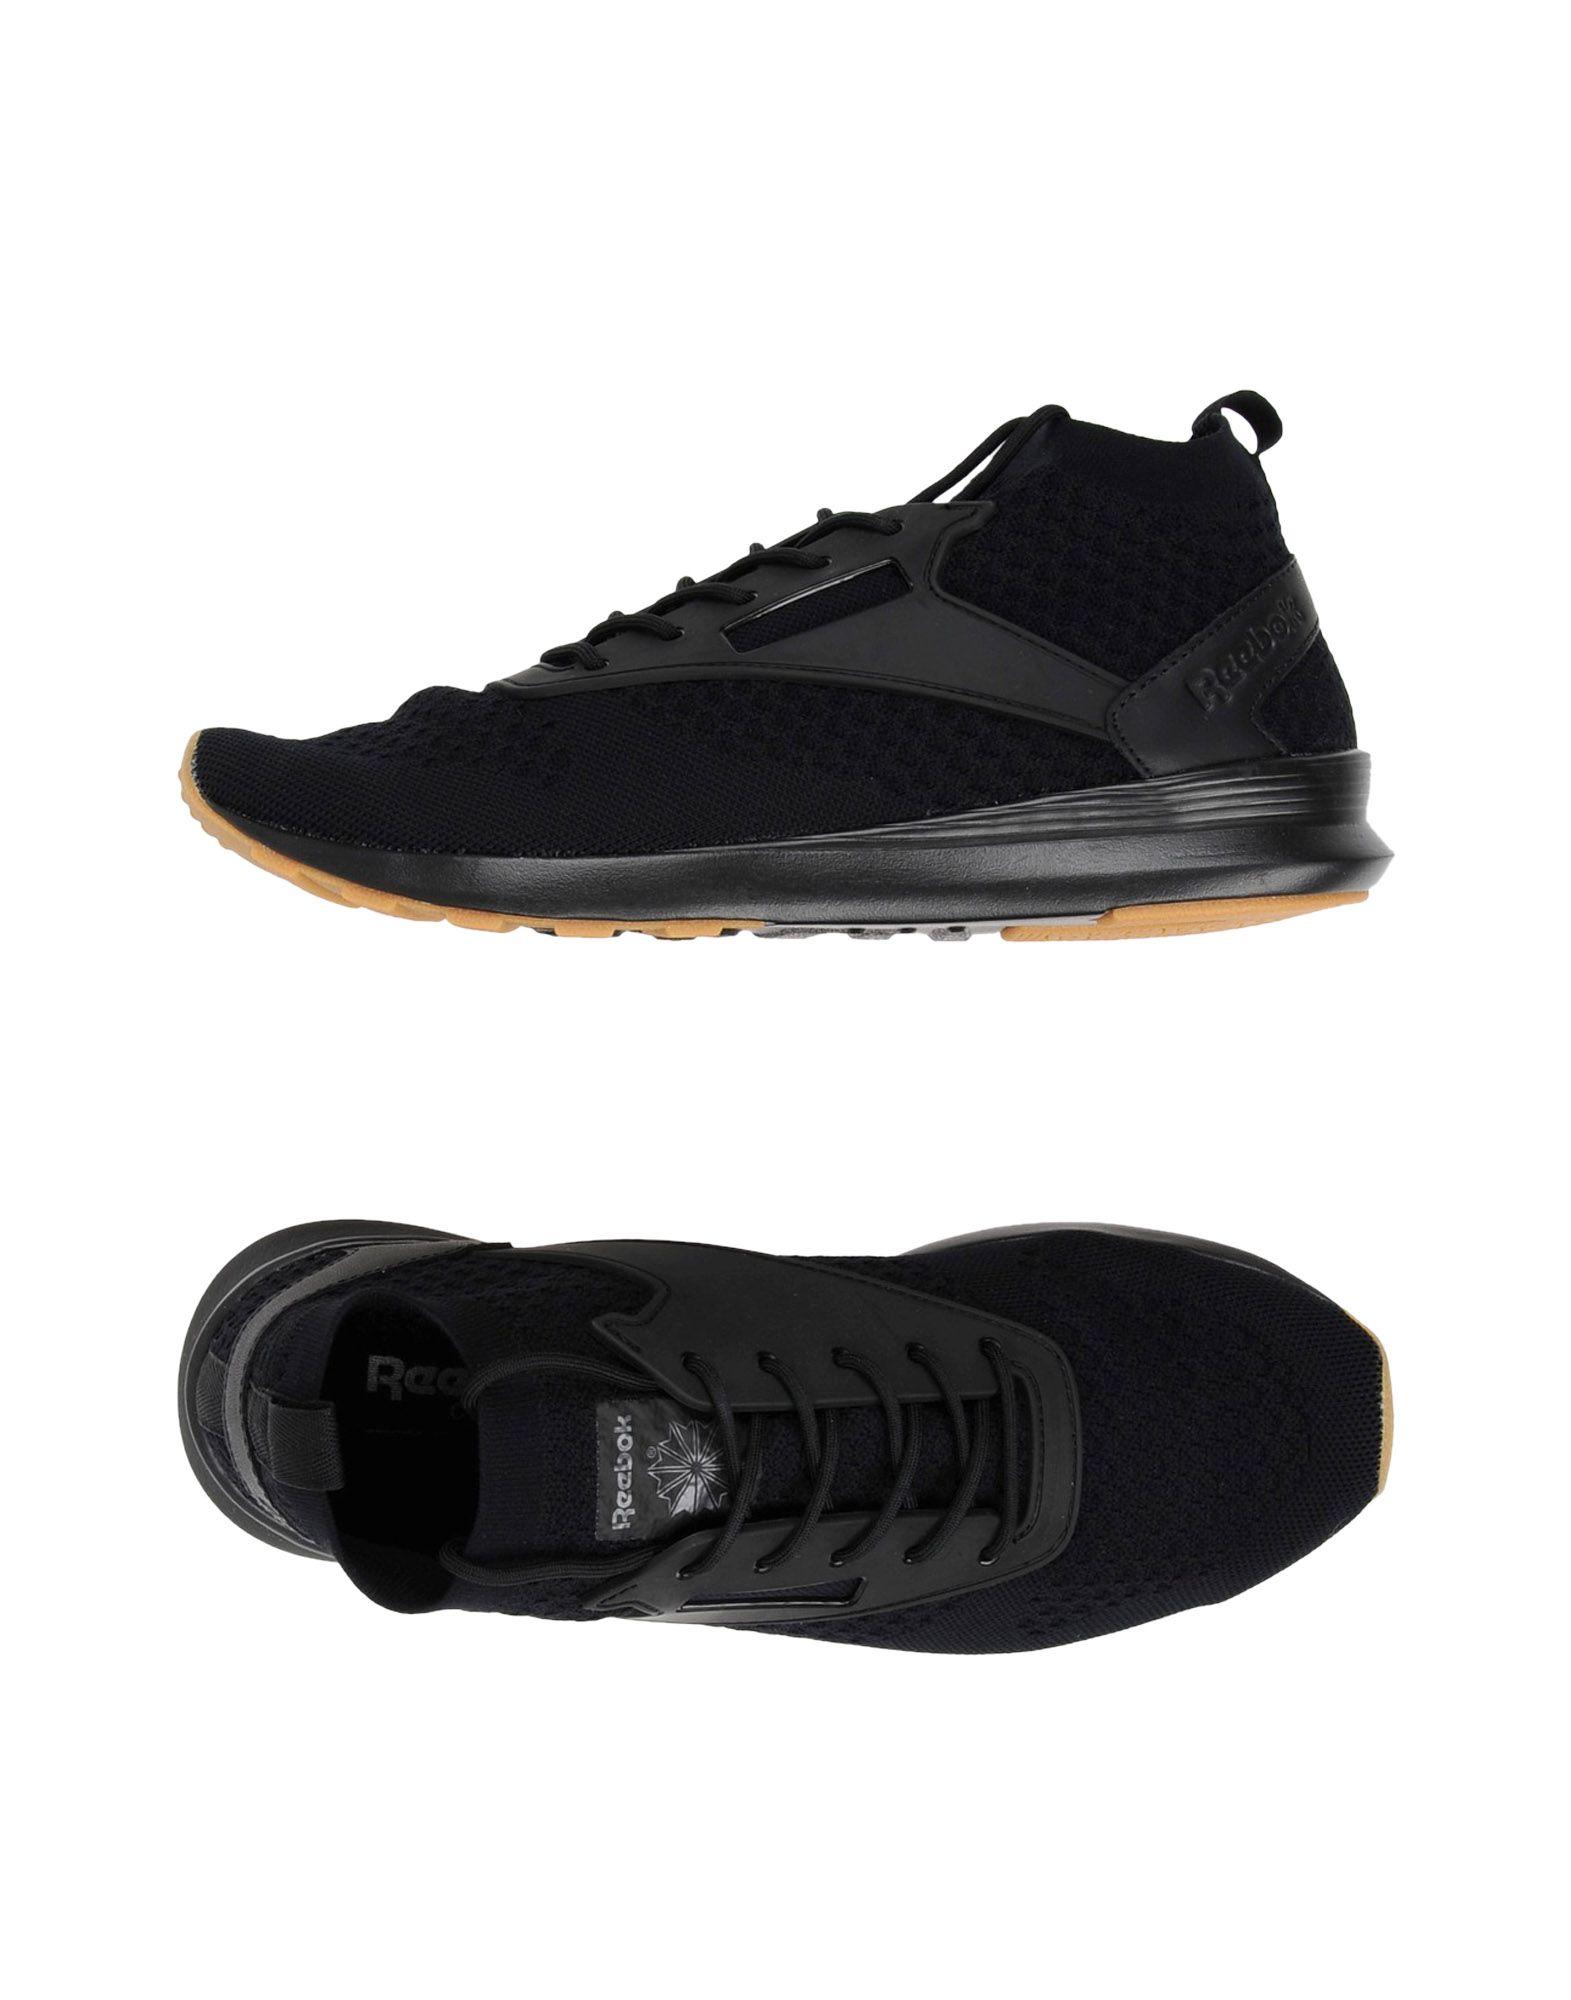 Sneakers Reebok Zoku Runner Ultk Gu - Uomo - Acquista online su